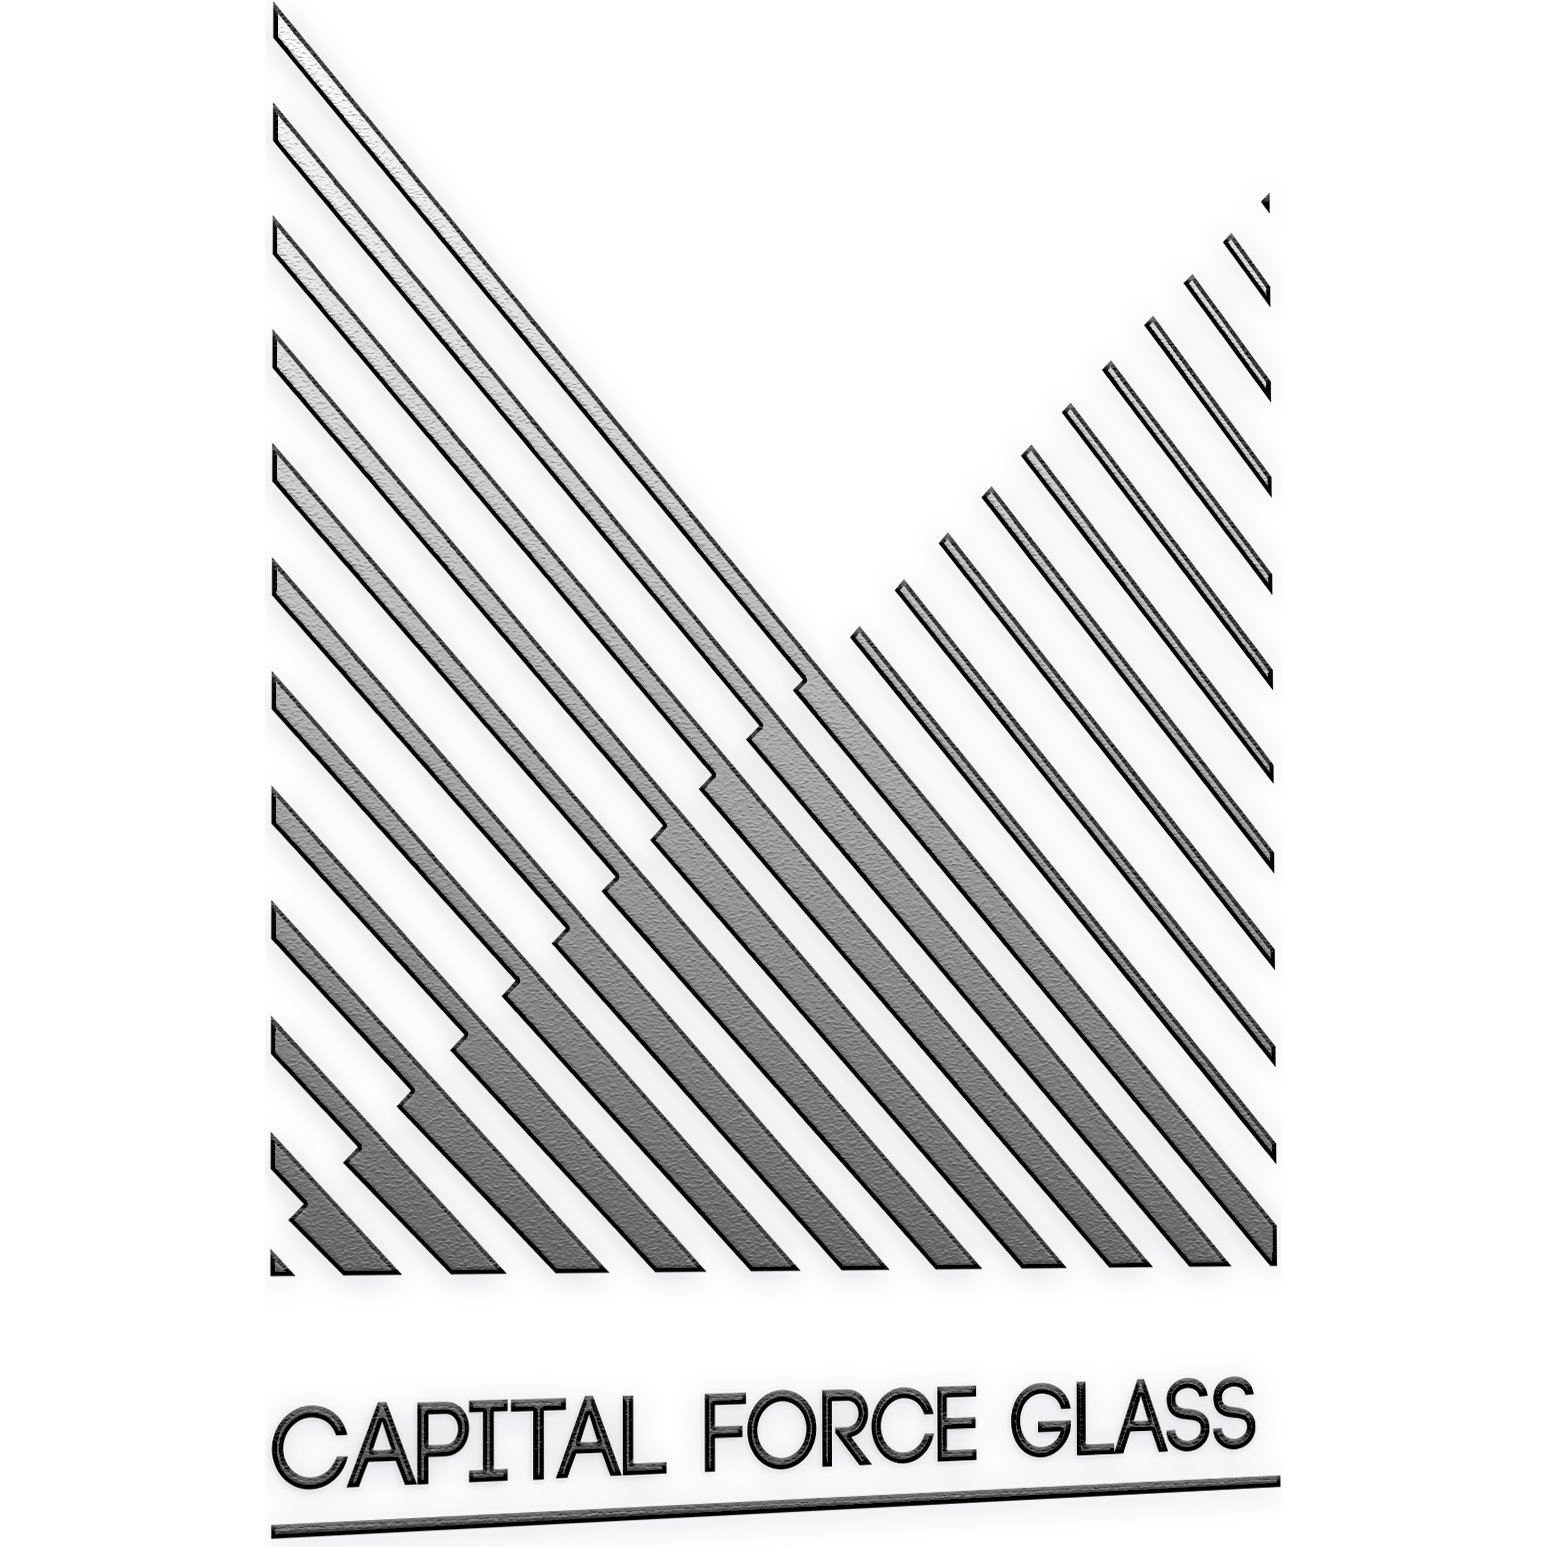 Capital Force Glass